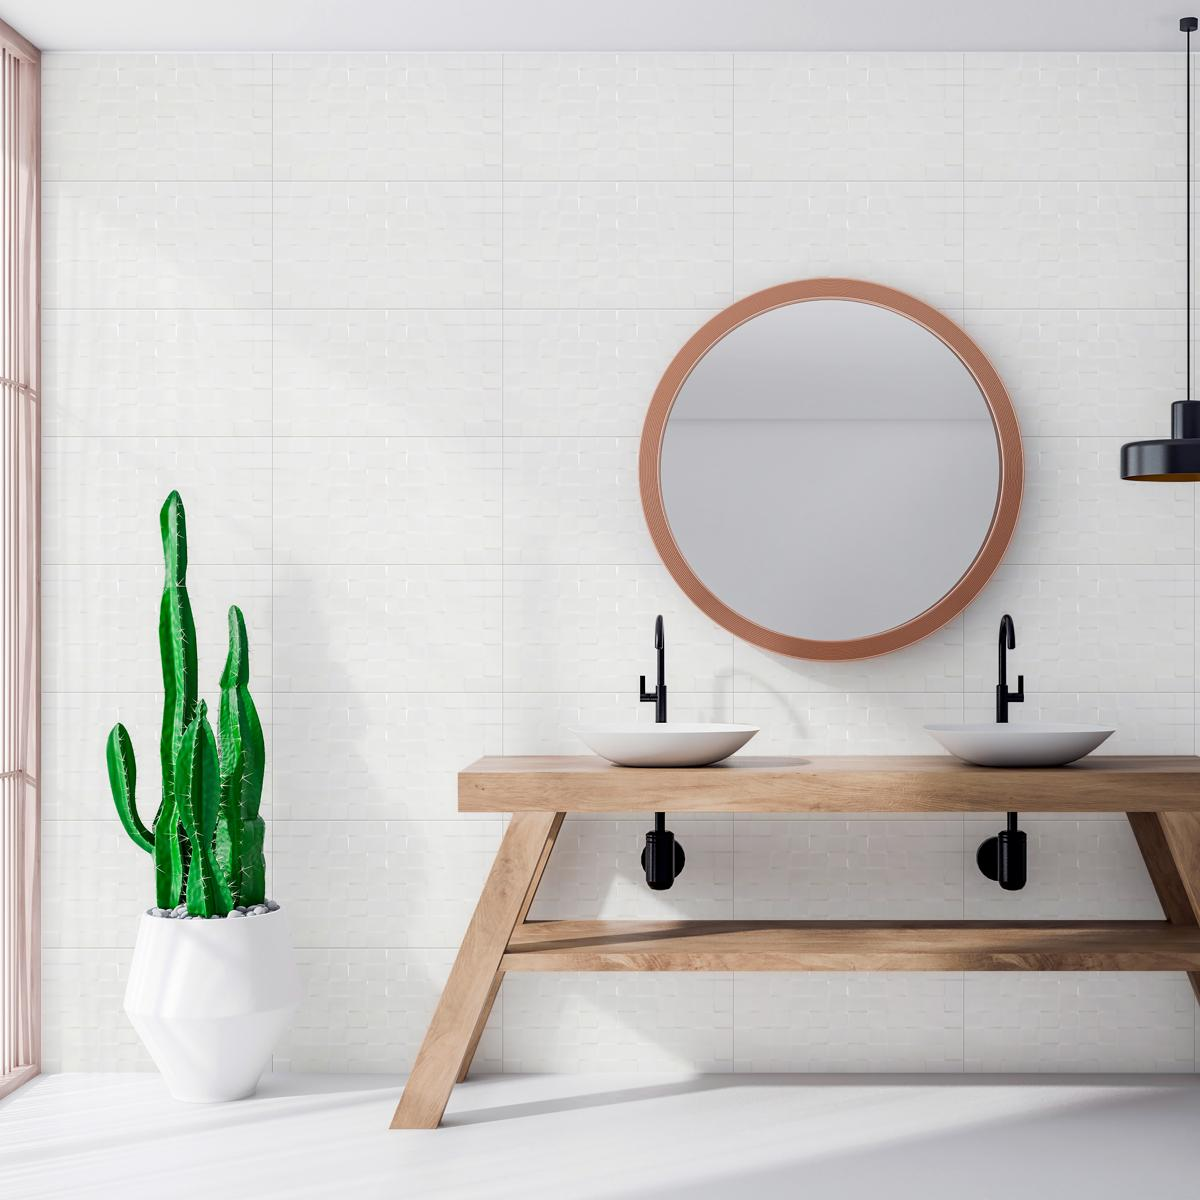 Mayólica Cubic Blanco Brillante - 33X55 cm - 1.84 m2